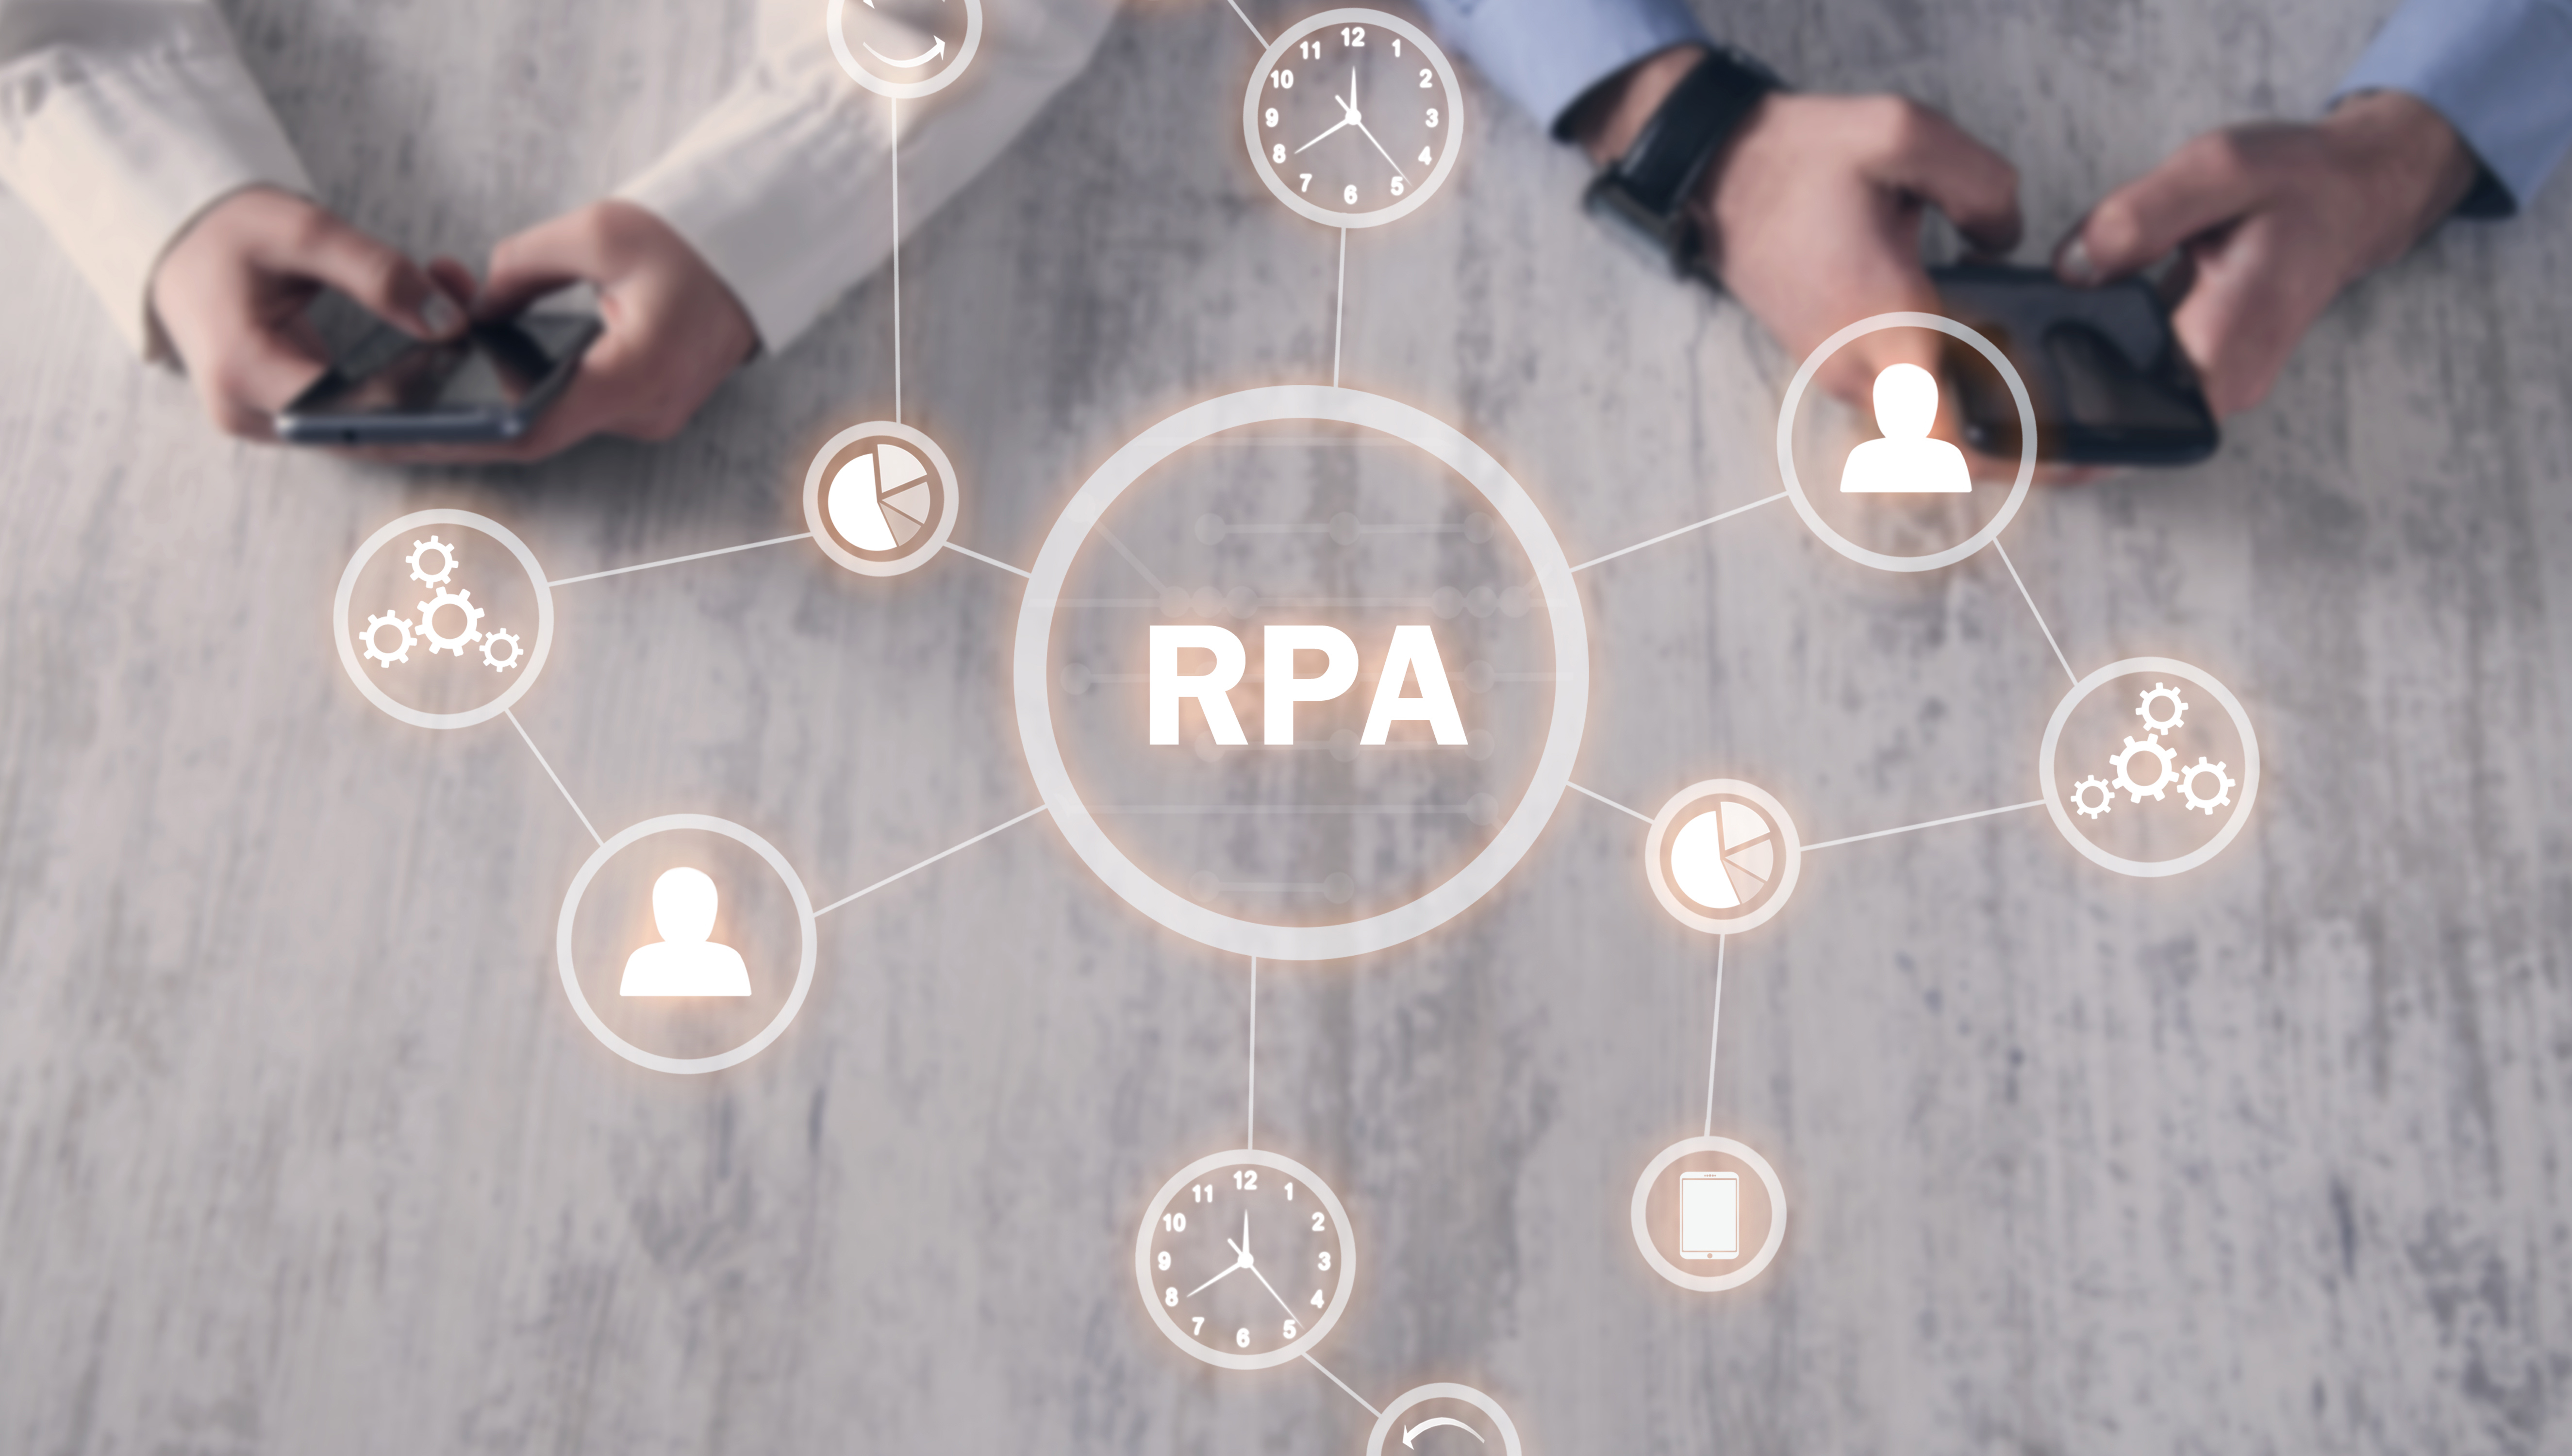 Thumbnail_RPA-as-a-Service - Thüga Unternehmen nutzten RPA onDemand